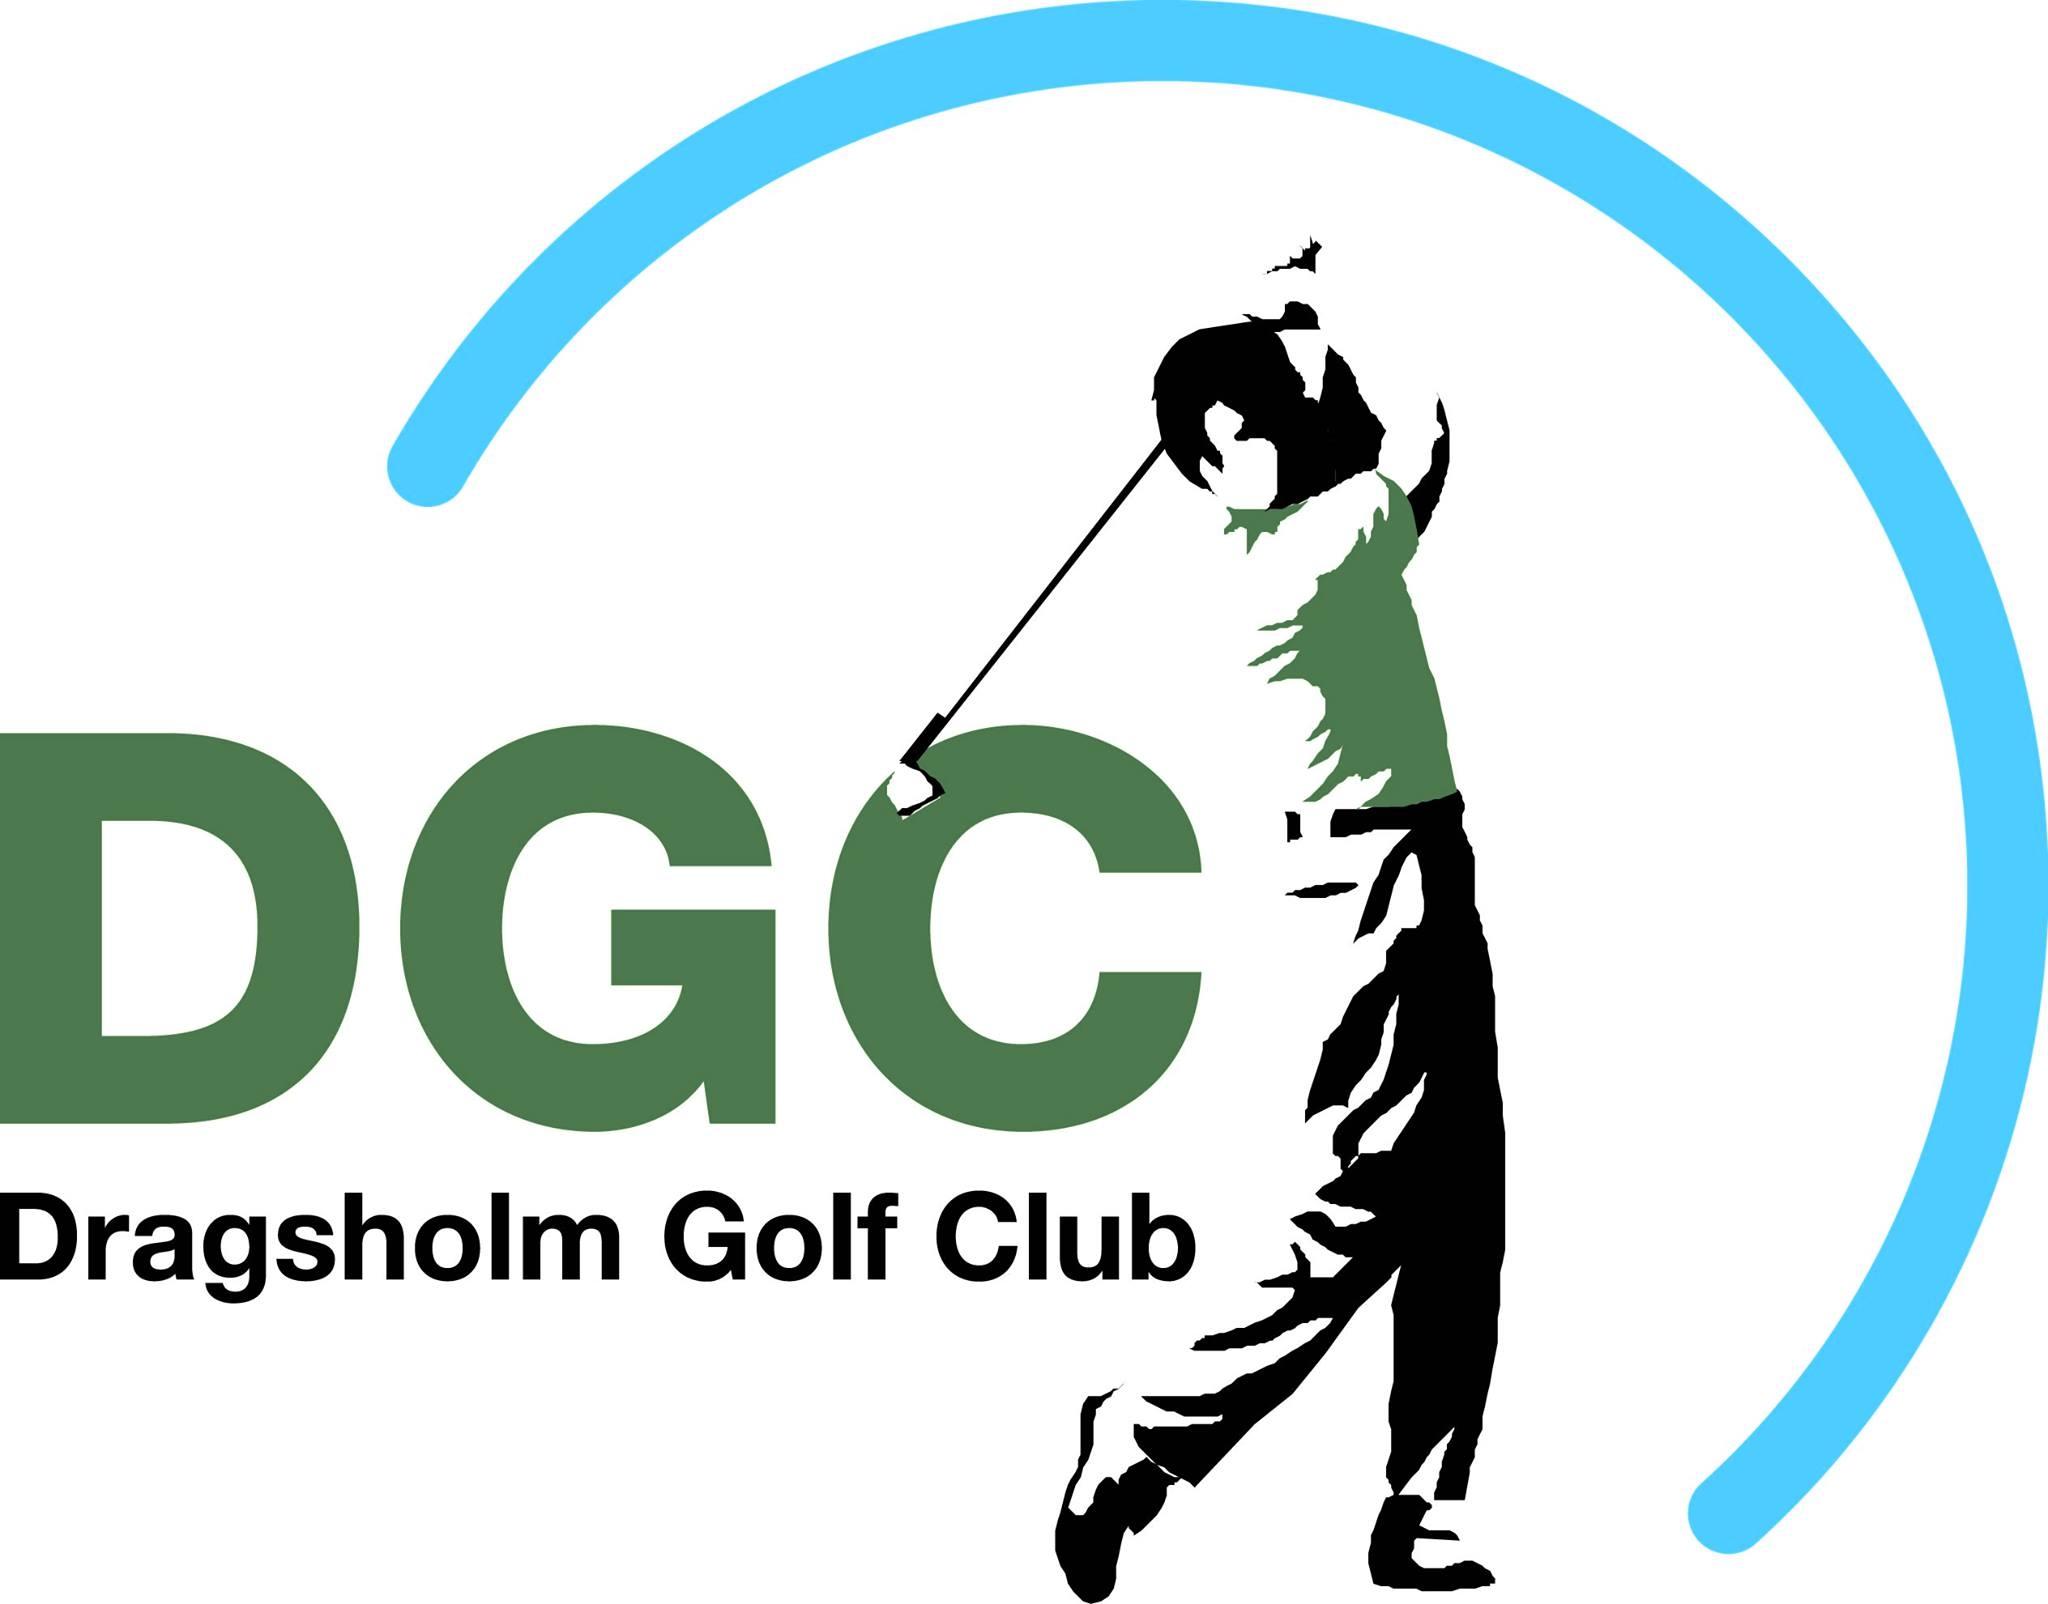 DGC Dragsholm Golf Club